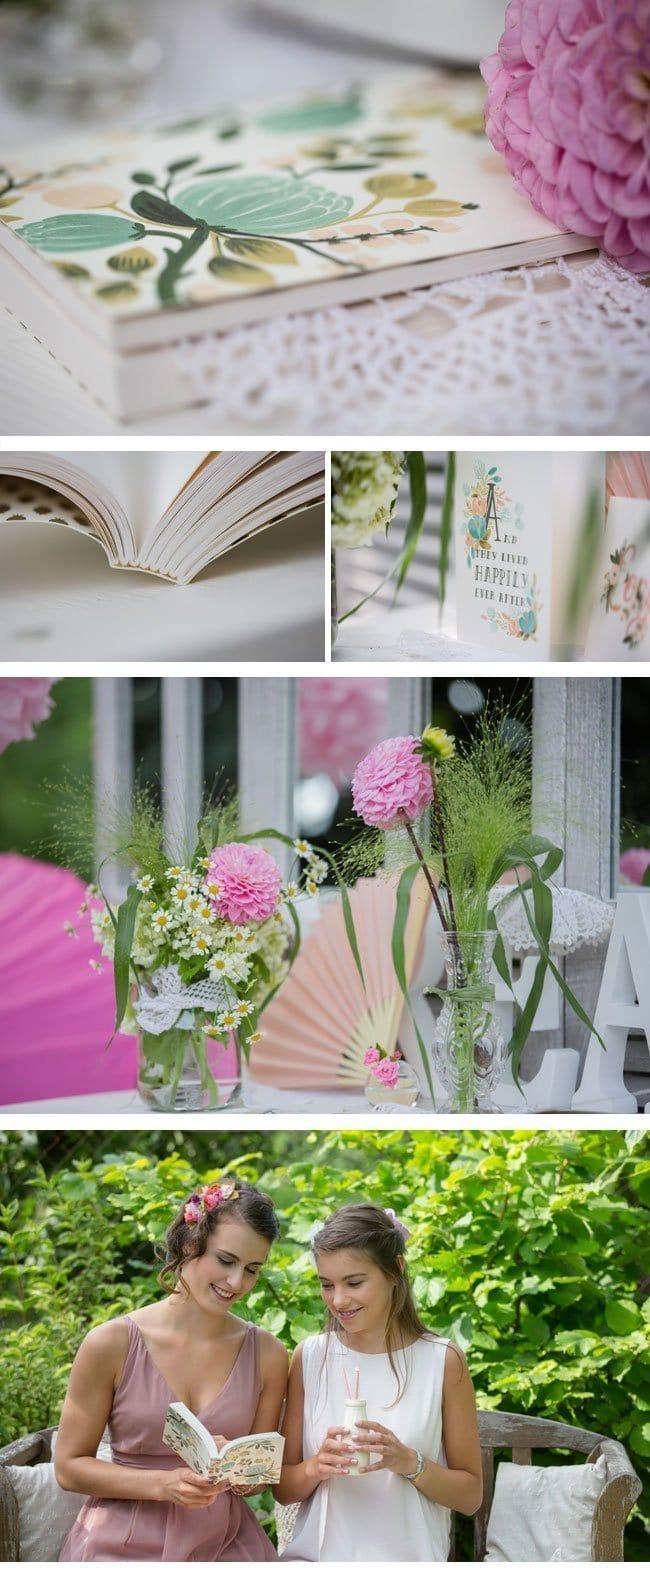 romantikfeeling17-bridal shower